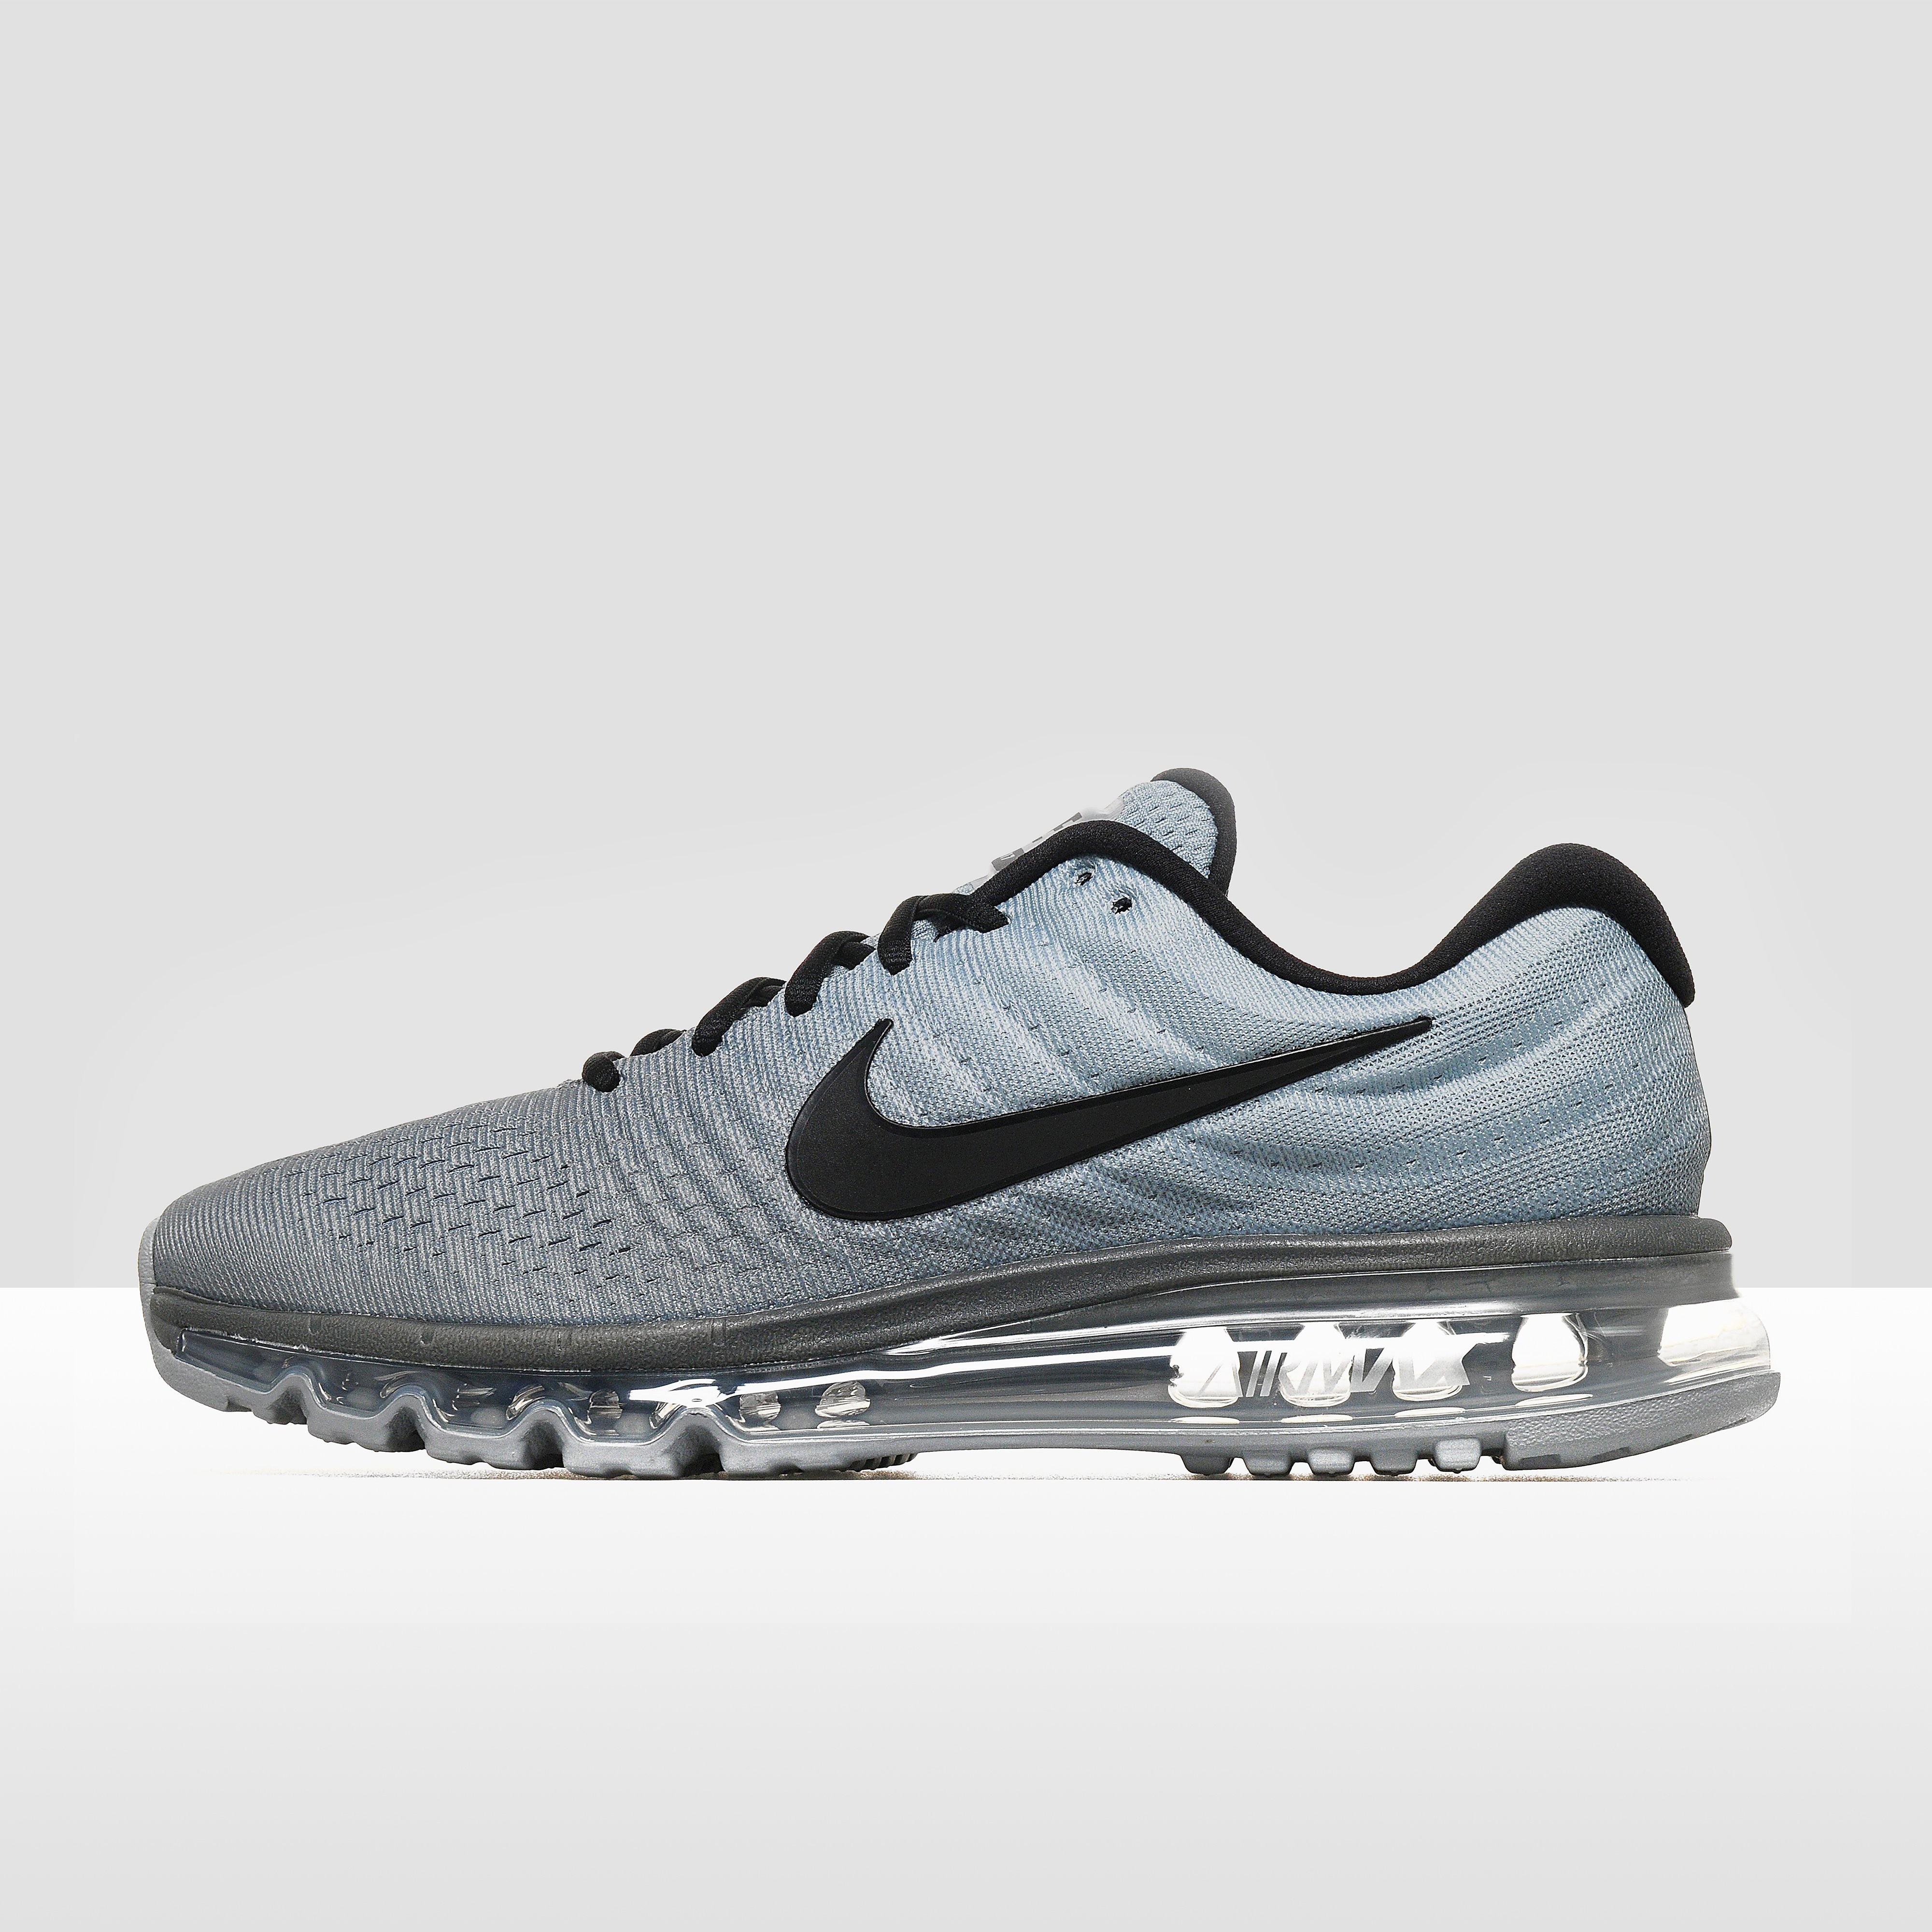 Nike Air Max 2017 Men's Running Shoes